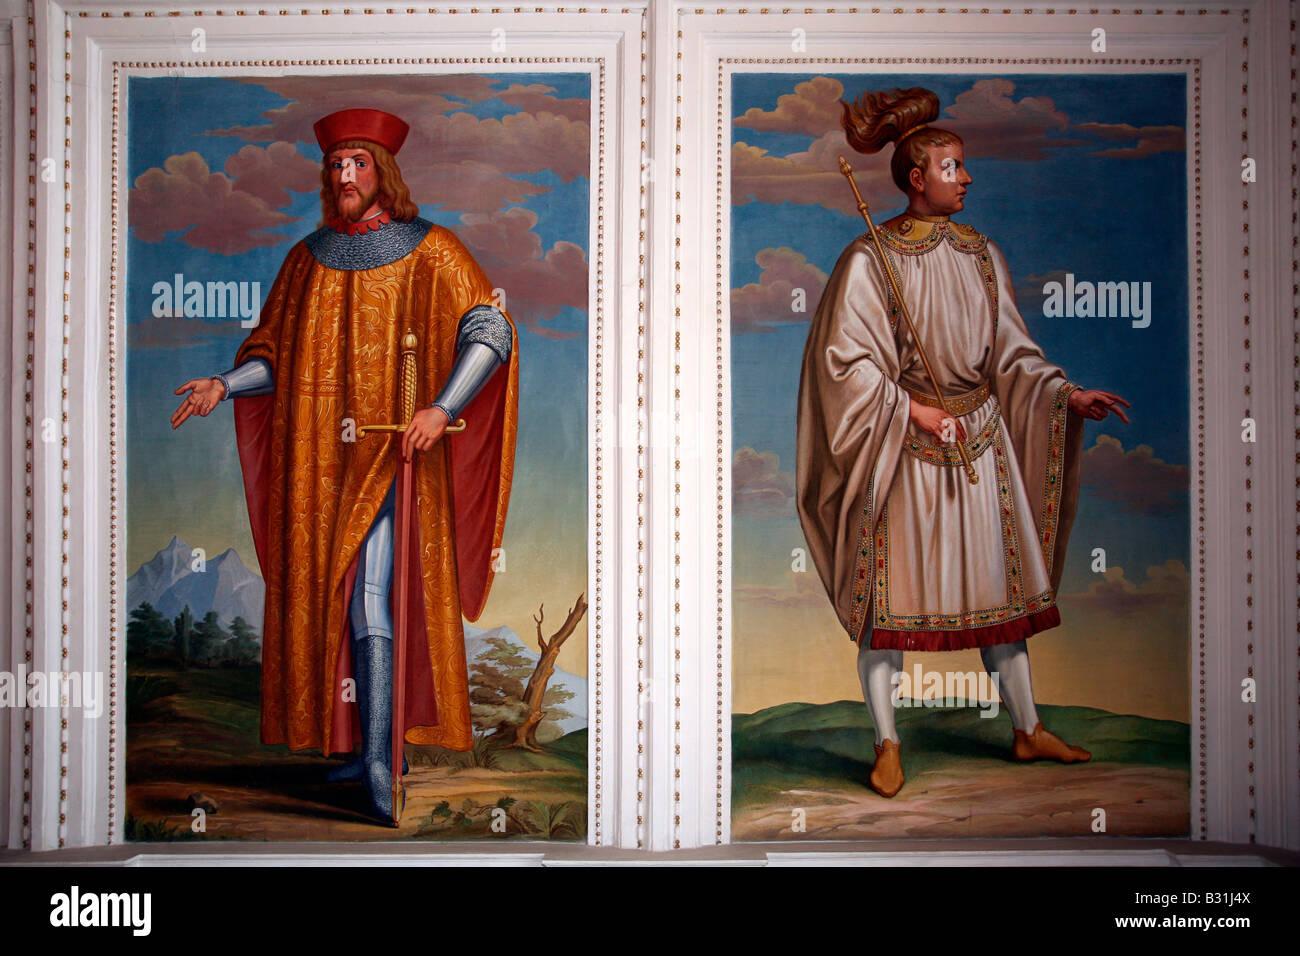 Innsbruck: Schloss Ambras: Spanish Hall: Paintings - Stock Image